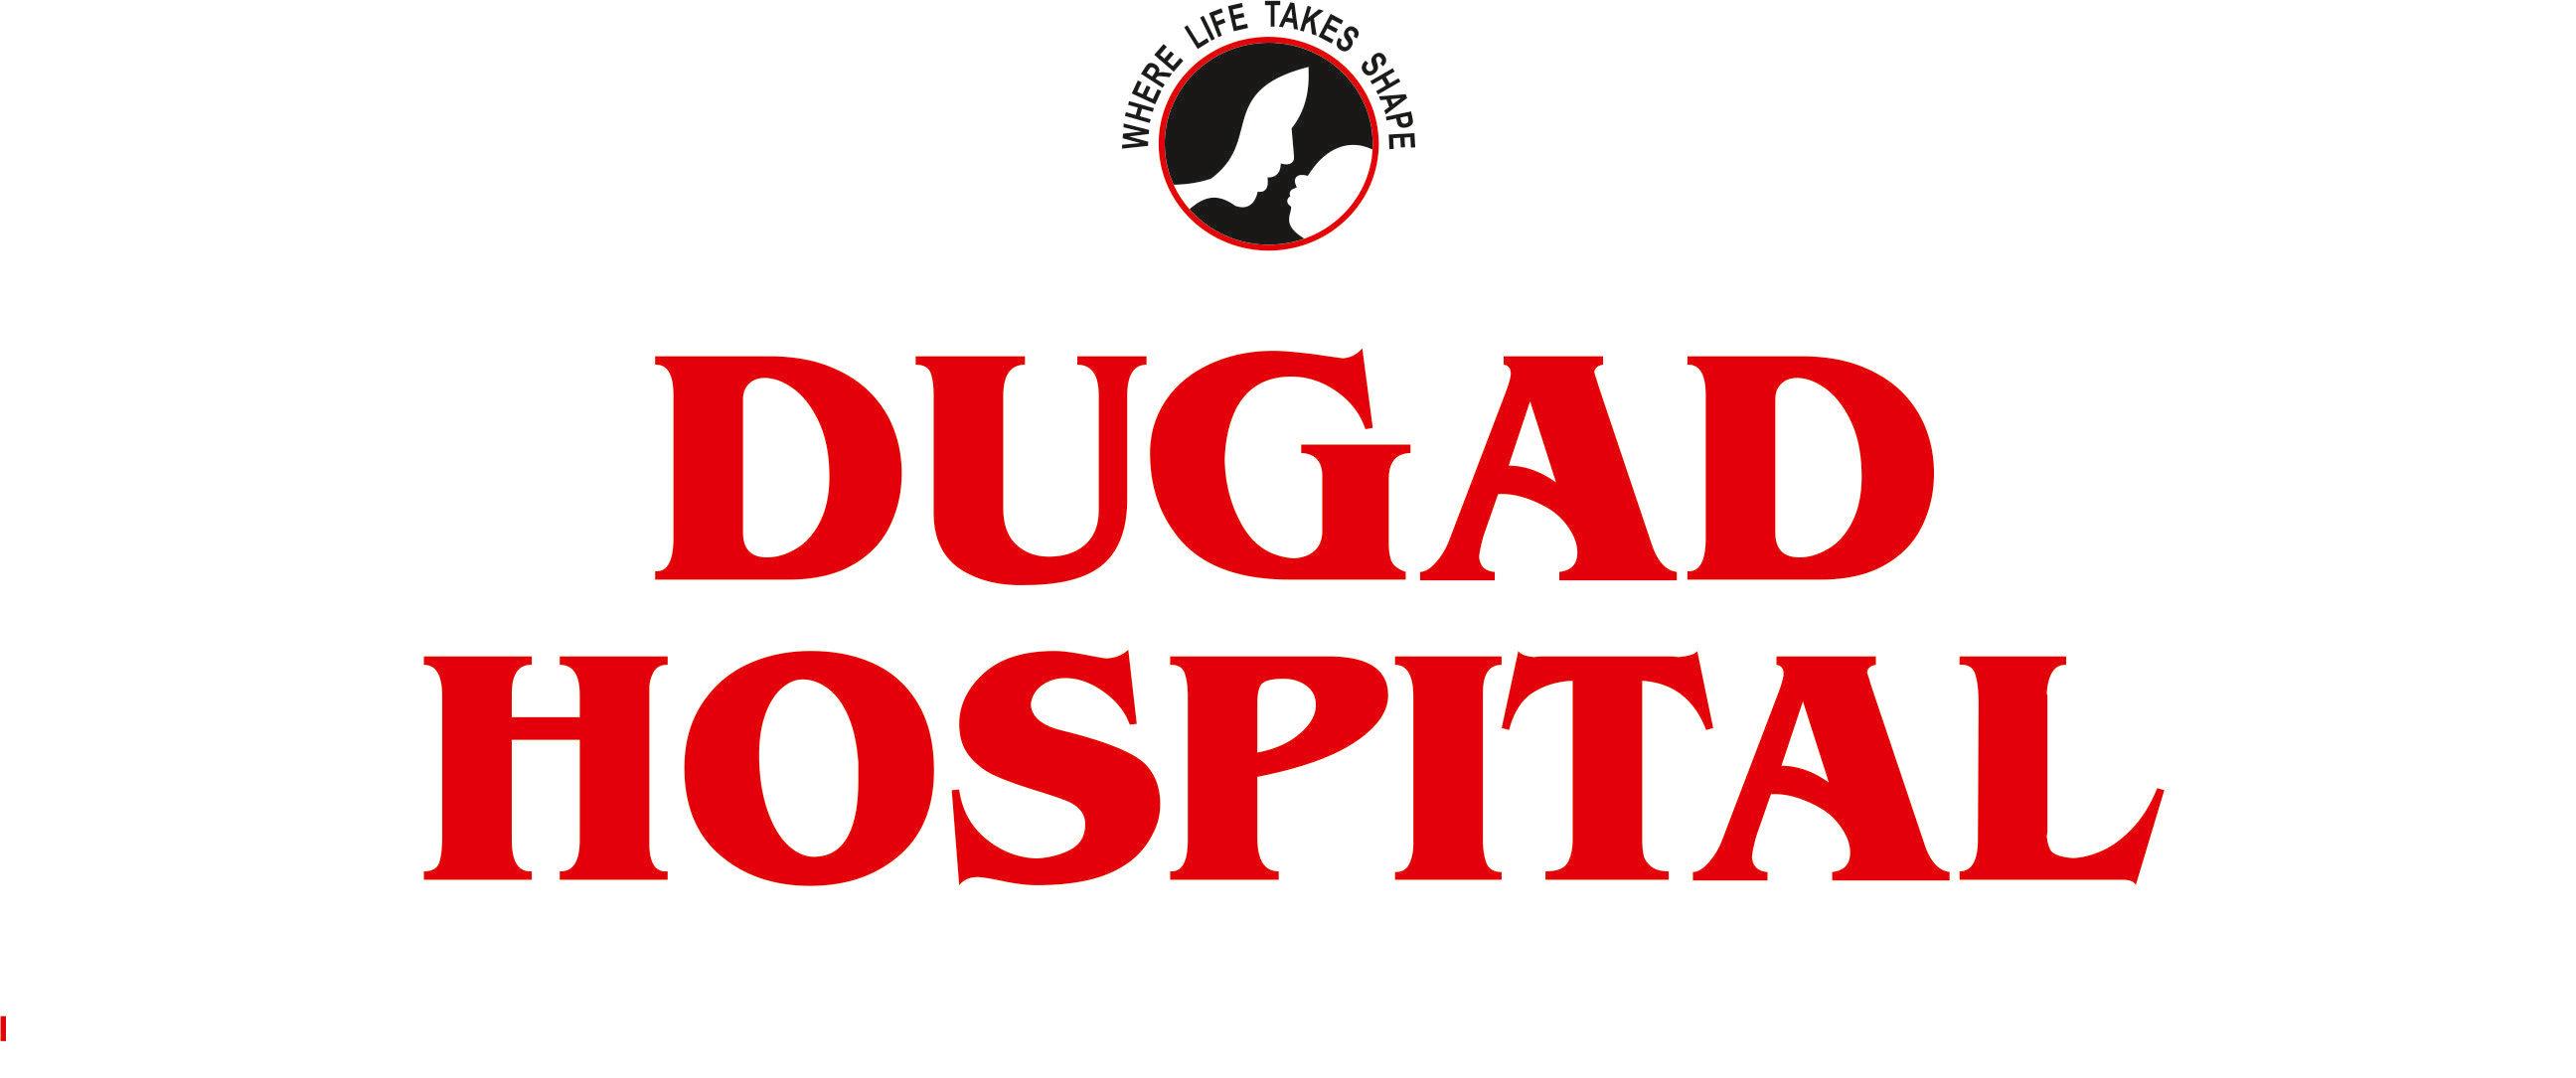 Dugad Hospital